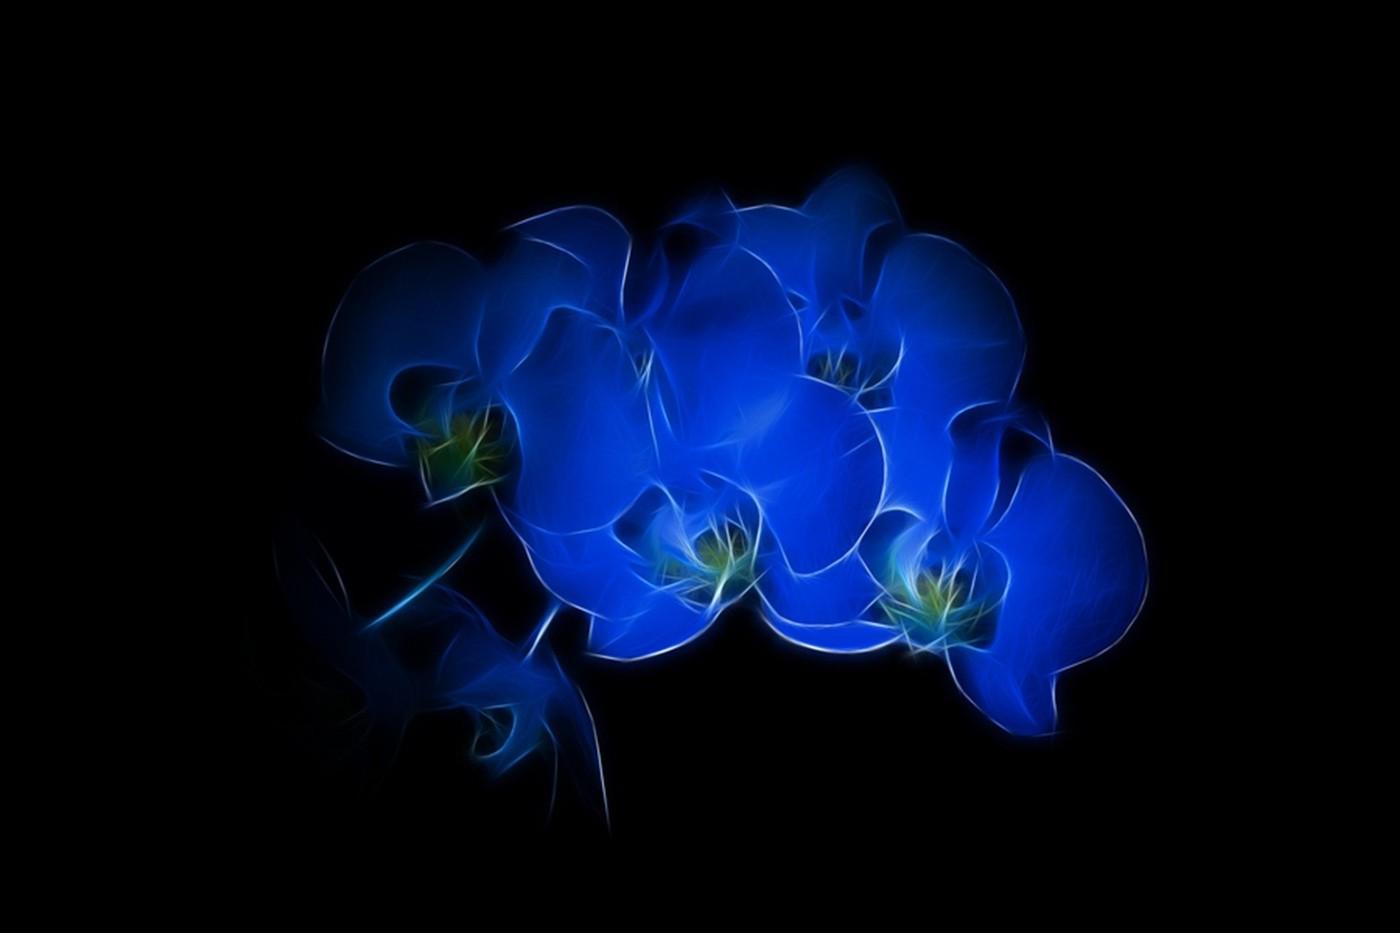 Wallpaper 1400x933 Px Black Background Blue Flowers